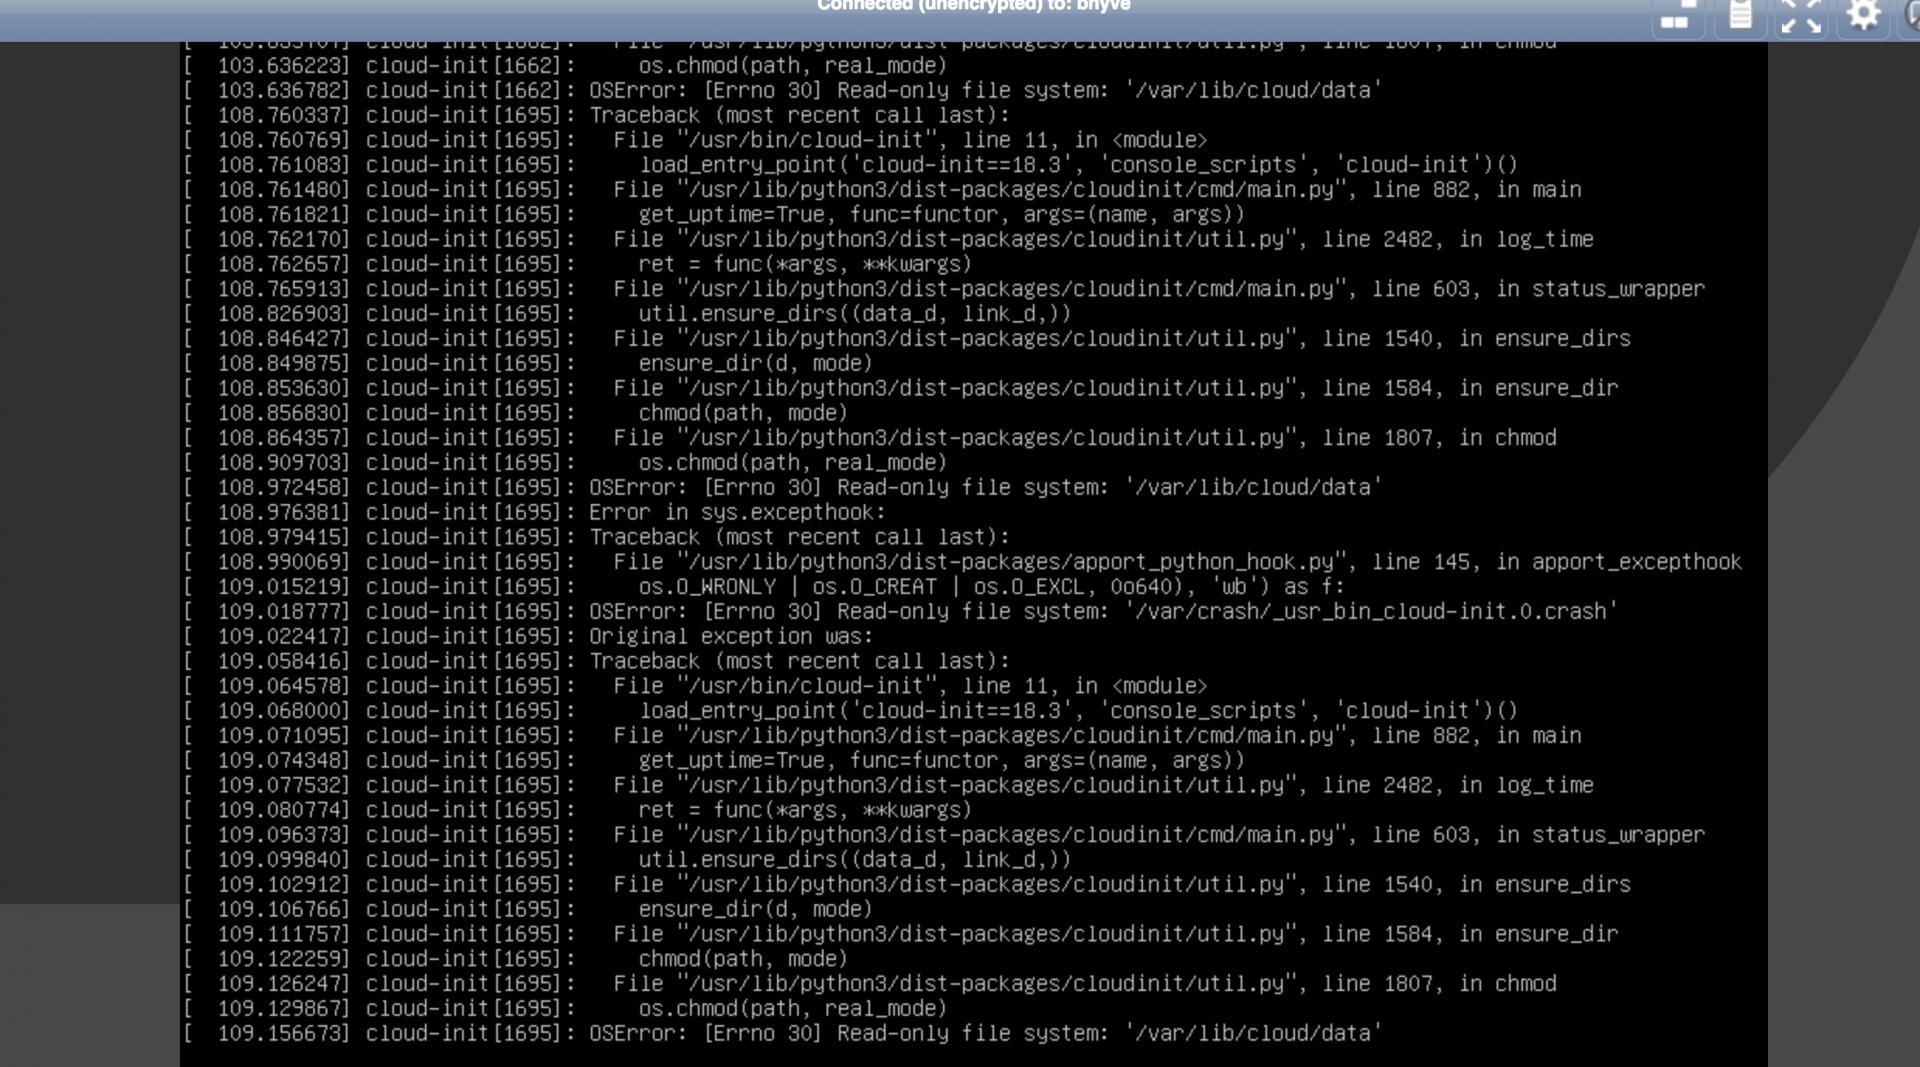 11 2 RC1 Ubuntu VM has problems accessing its disk